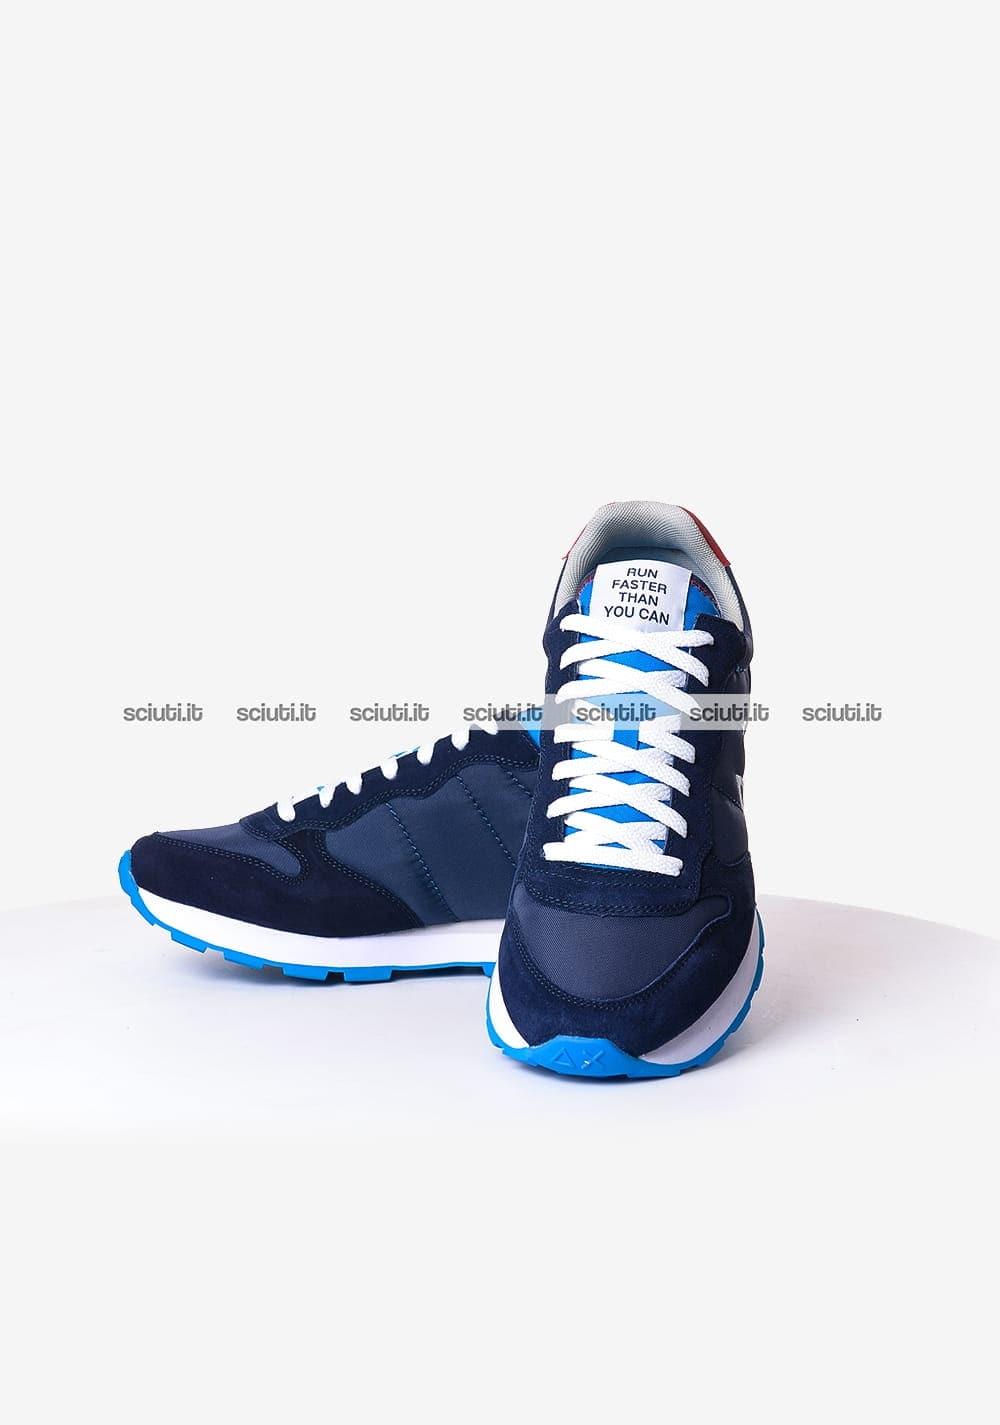 Scarpe Sun68 uomo Tom solid nylon blu navy turchese | Sciuti.it